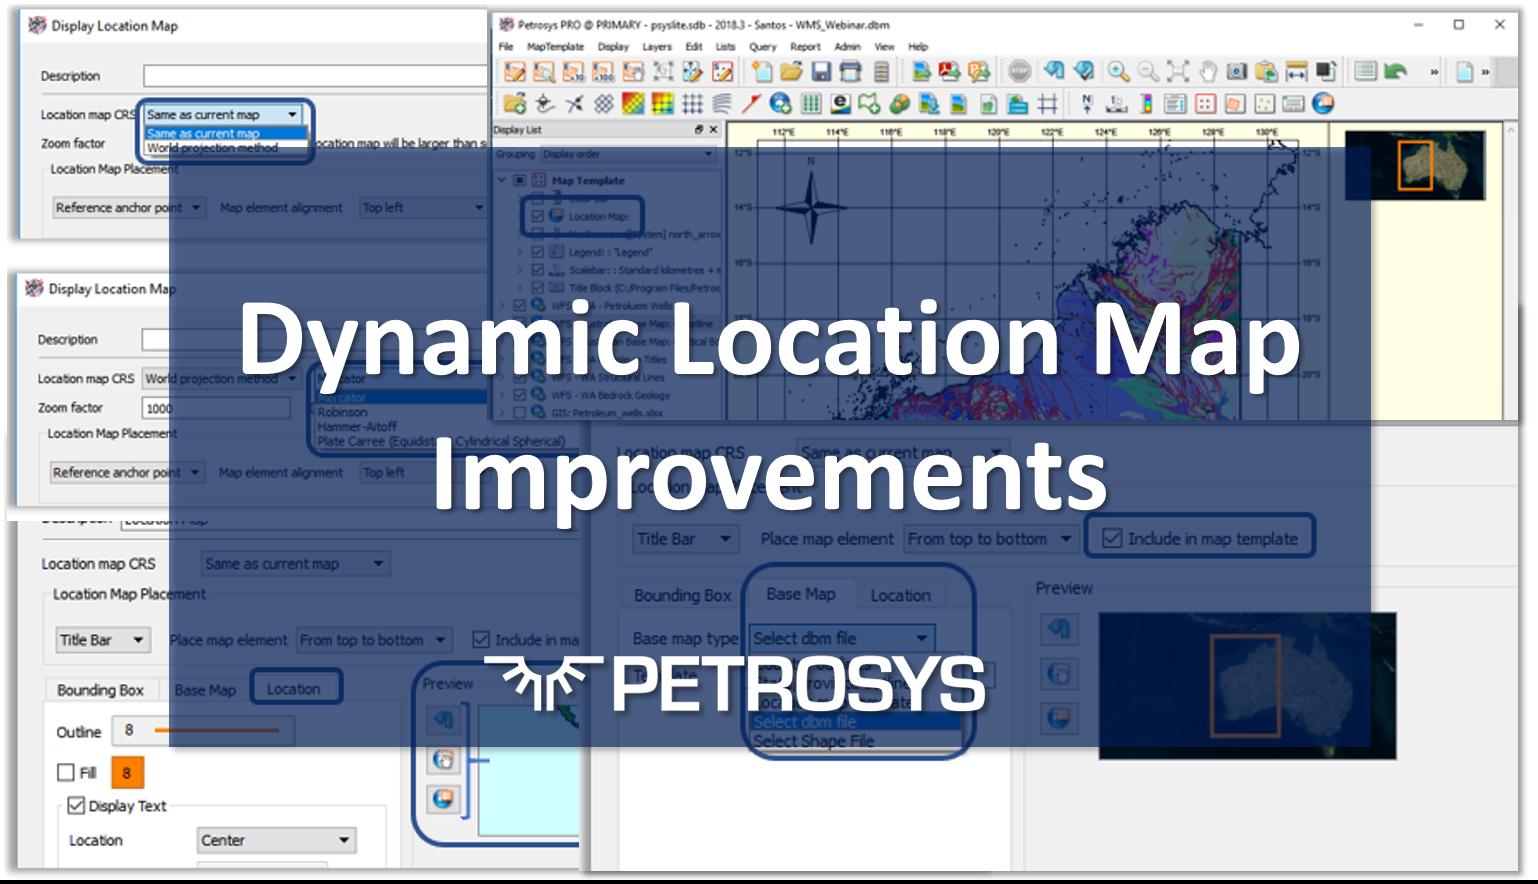 Dynamic Location Map Improvements